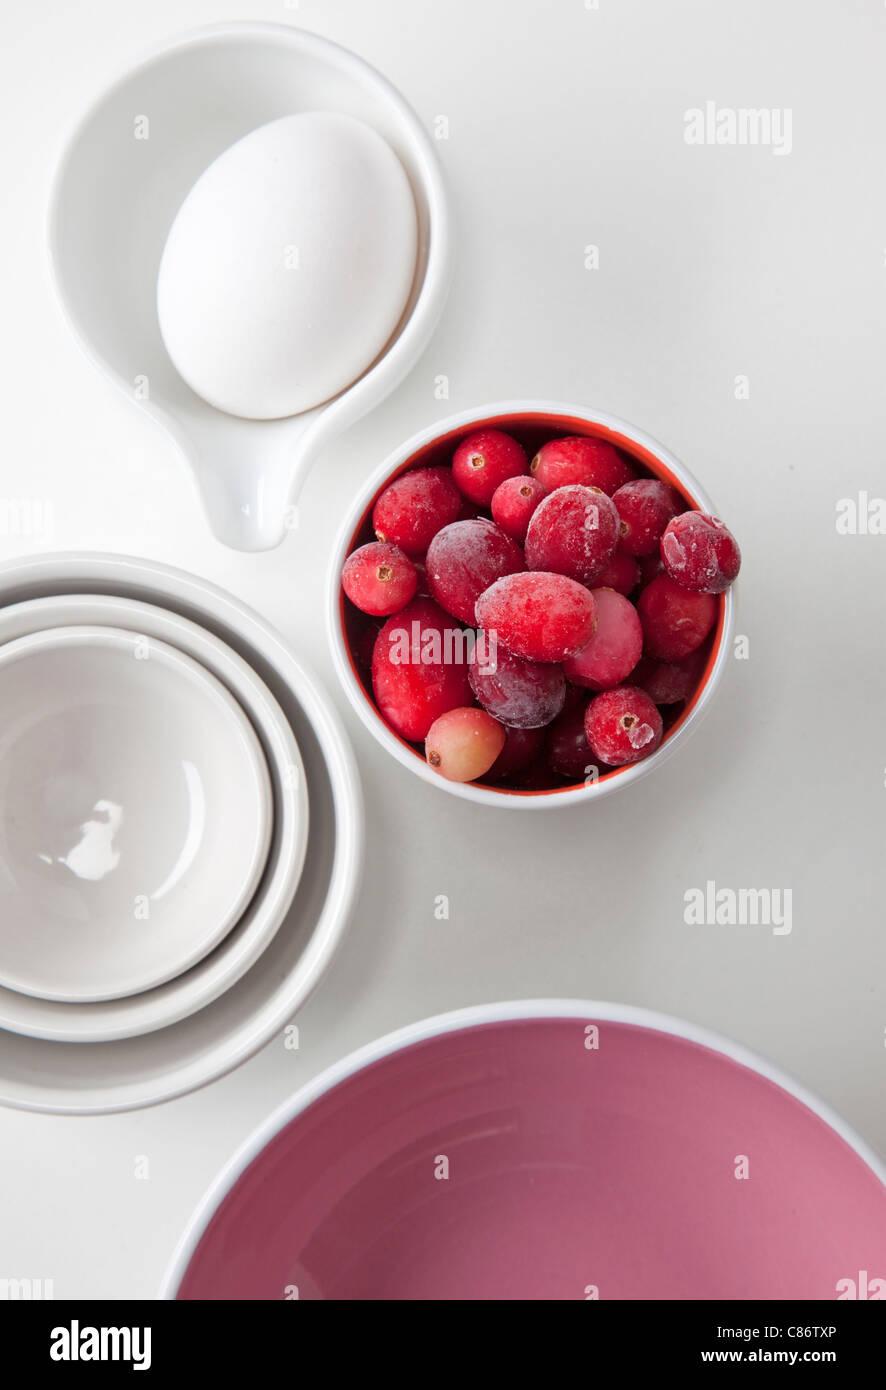 Elementi di cucina e alimenti Immagini Stock